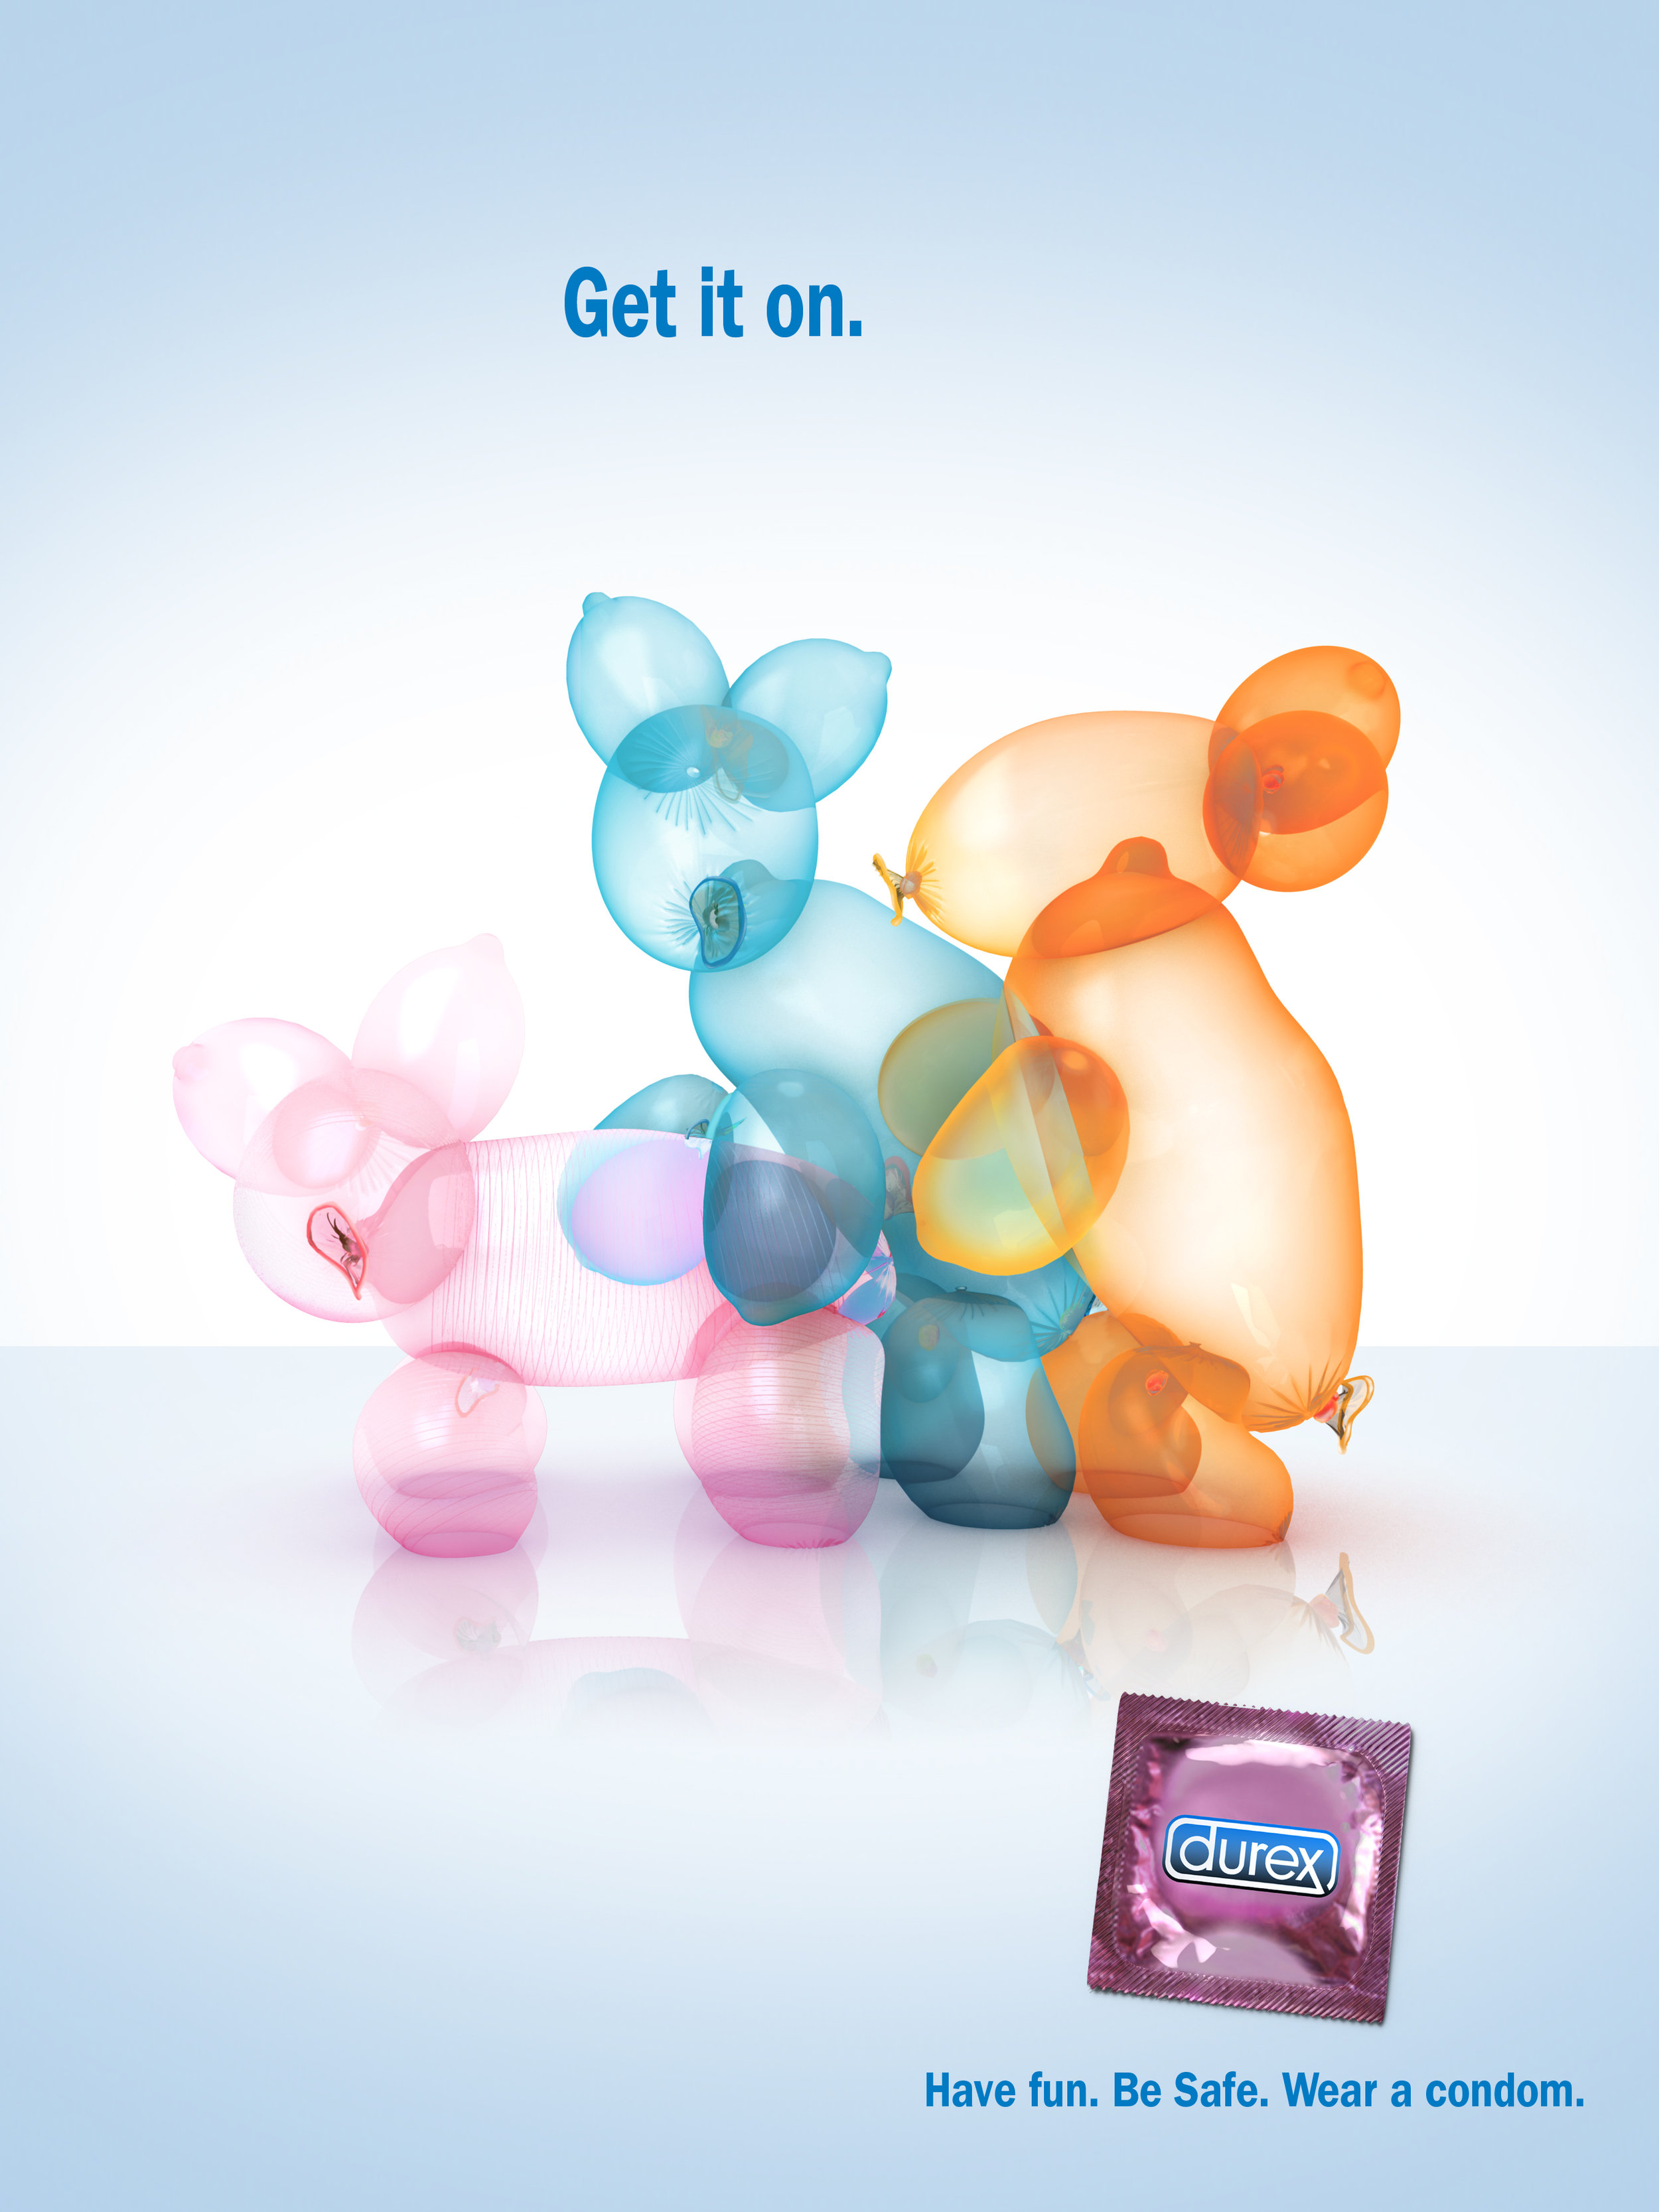 Poster for Durex condoms.